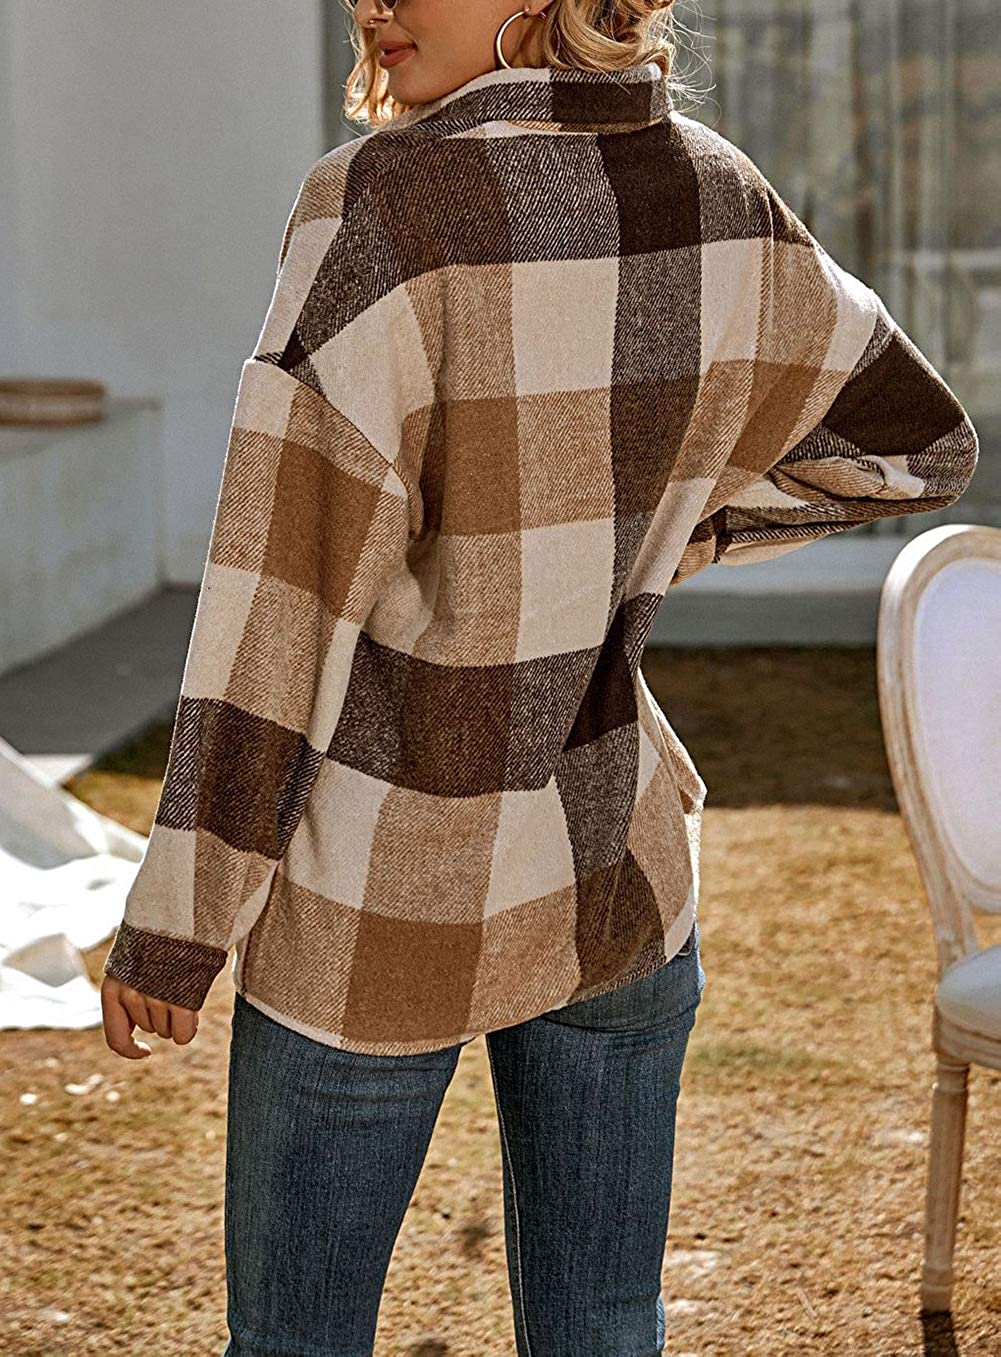 chouyatou Women's Oversized Casual Button Down Plaid Shirt Jacket Flannel Shacket